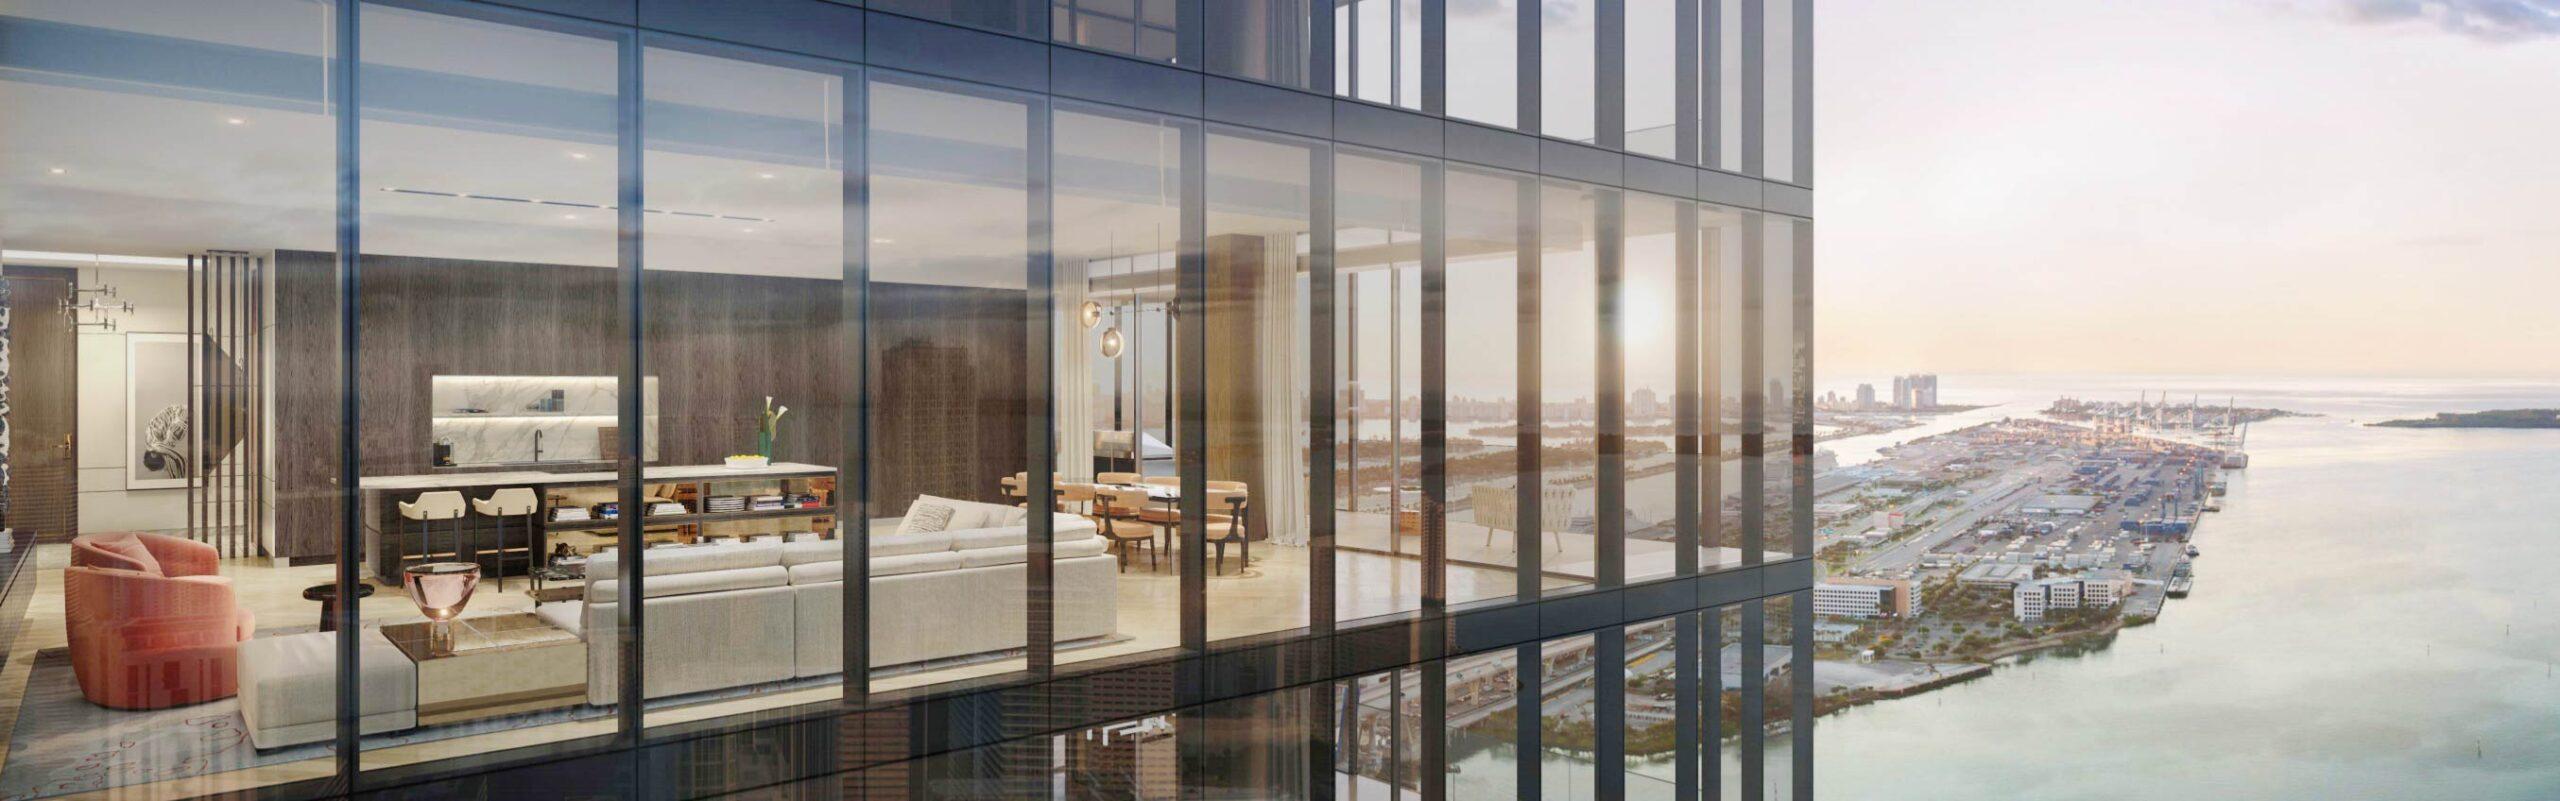 waldorf-astoria-miami-residences-condos-preconstrucion-florida-new-york